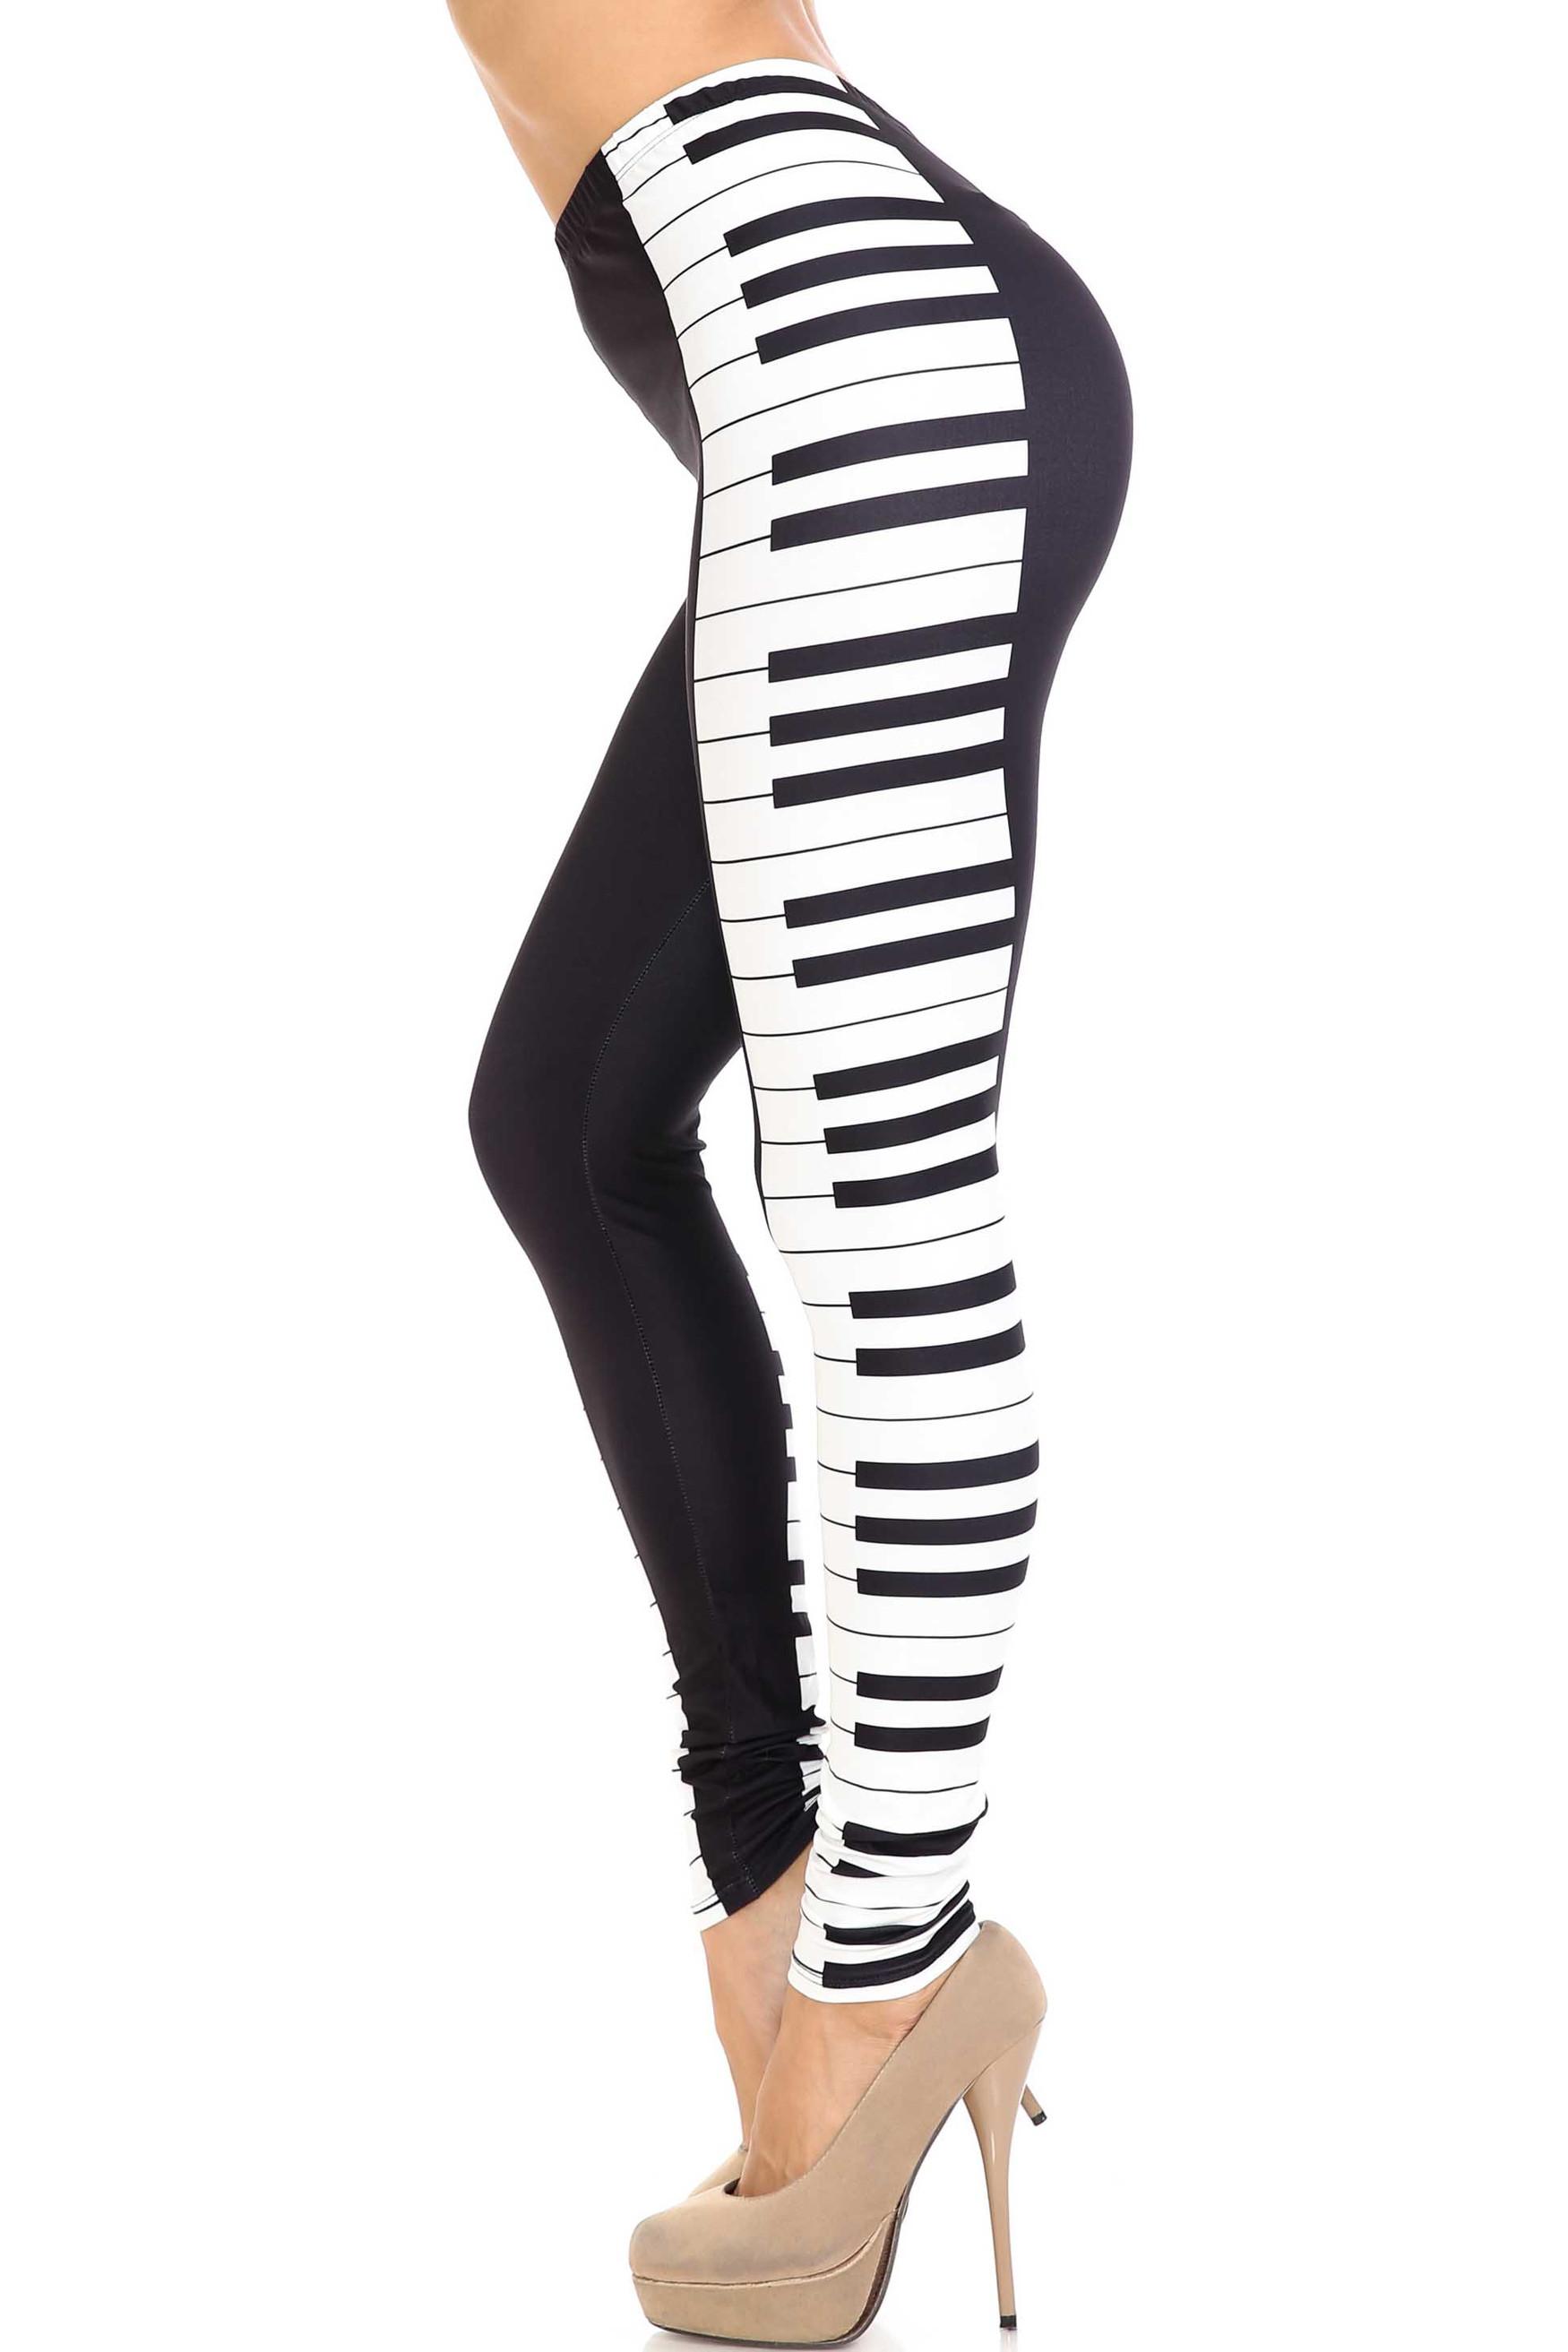 Creamy Soft Keys of the Piano Extra Plus Size Leggings - 3X-5X - USA Fashion™